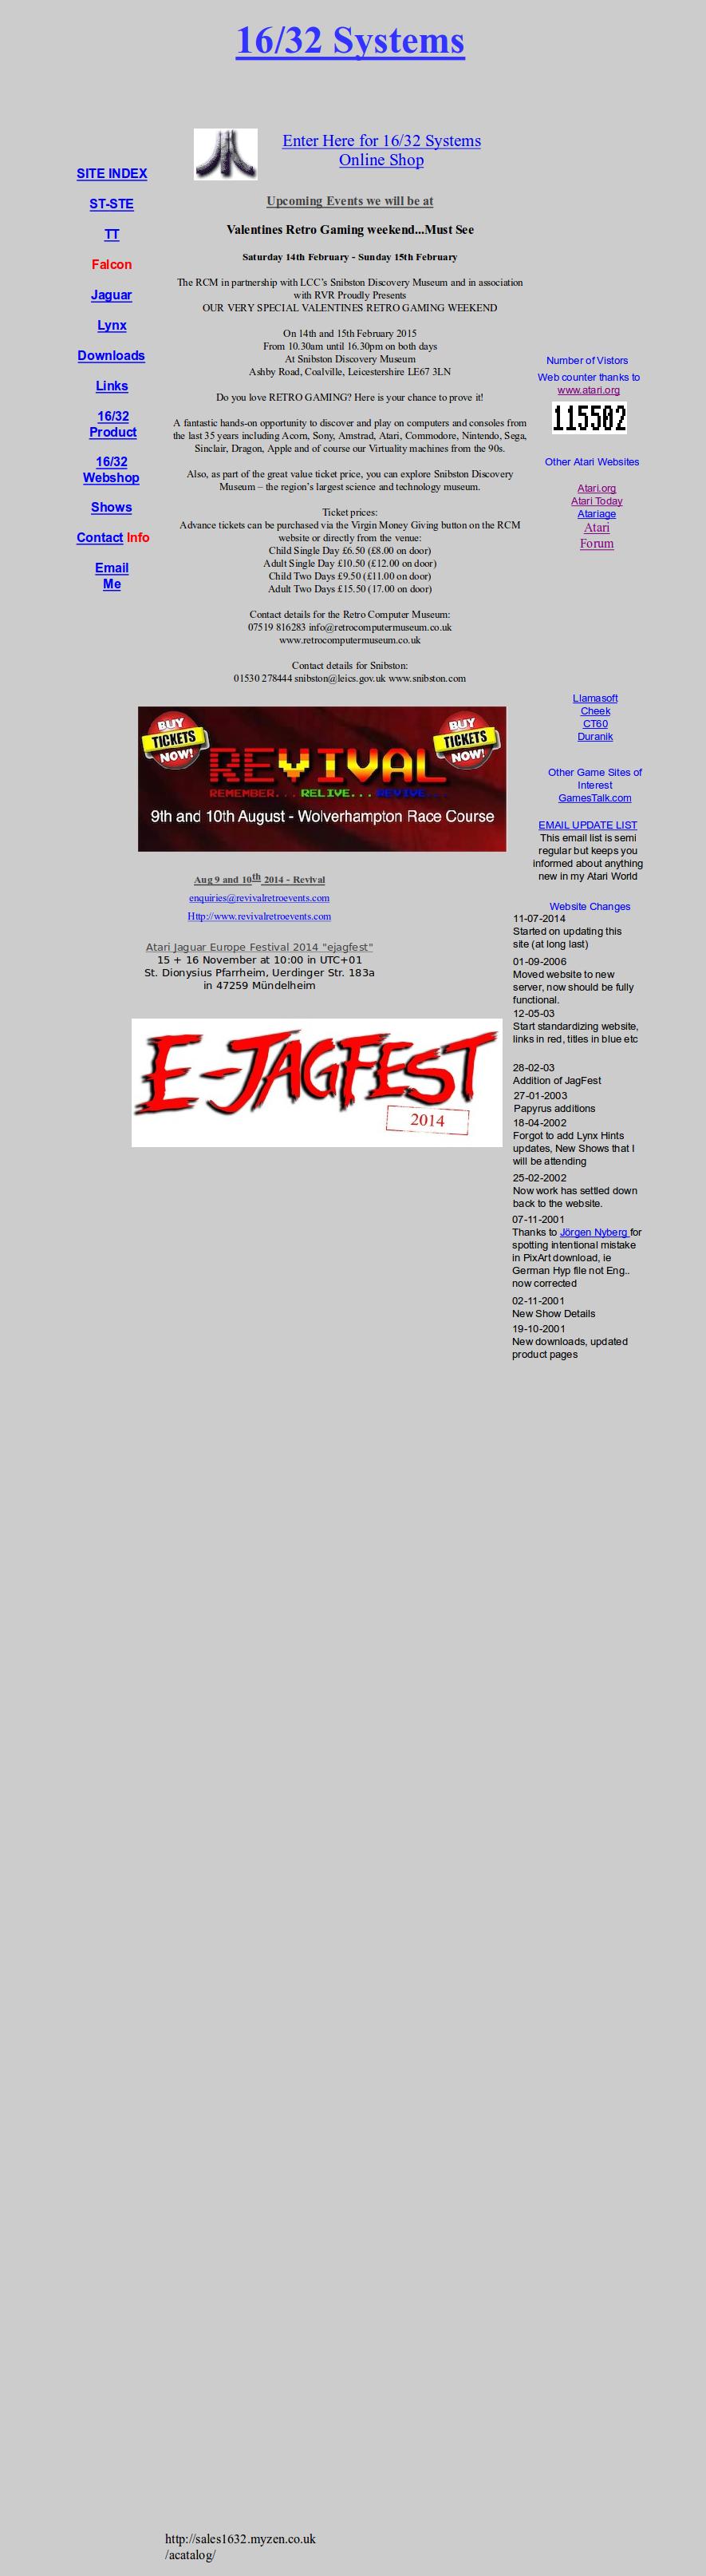 Screenshot of website 16/32 Systems